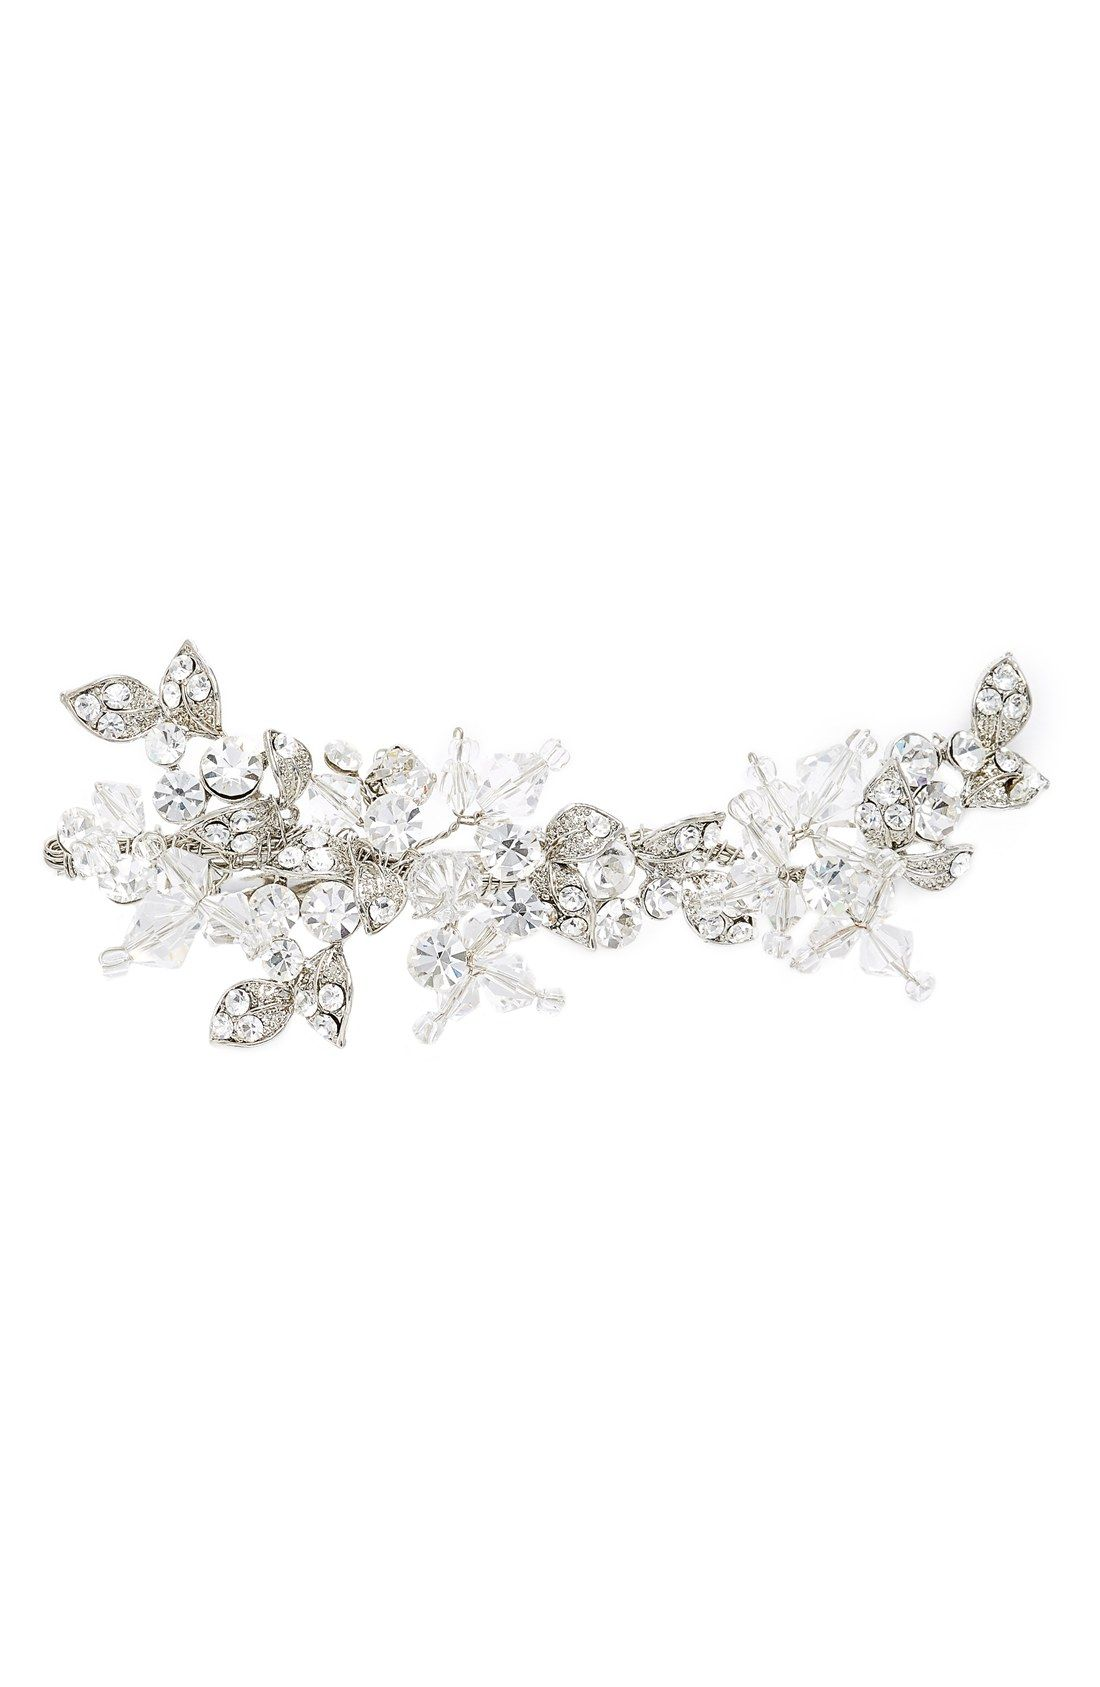 brides & hairpins 'olivia' jeweled hair clip | hairpins